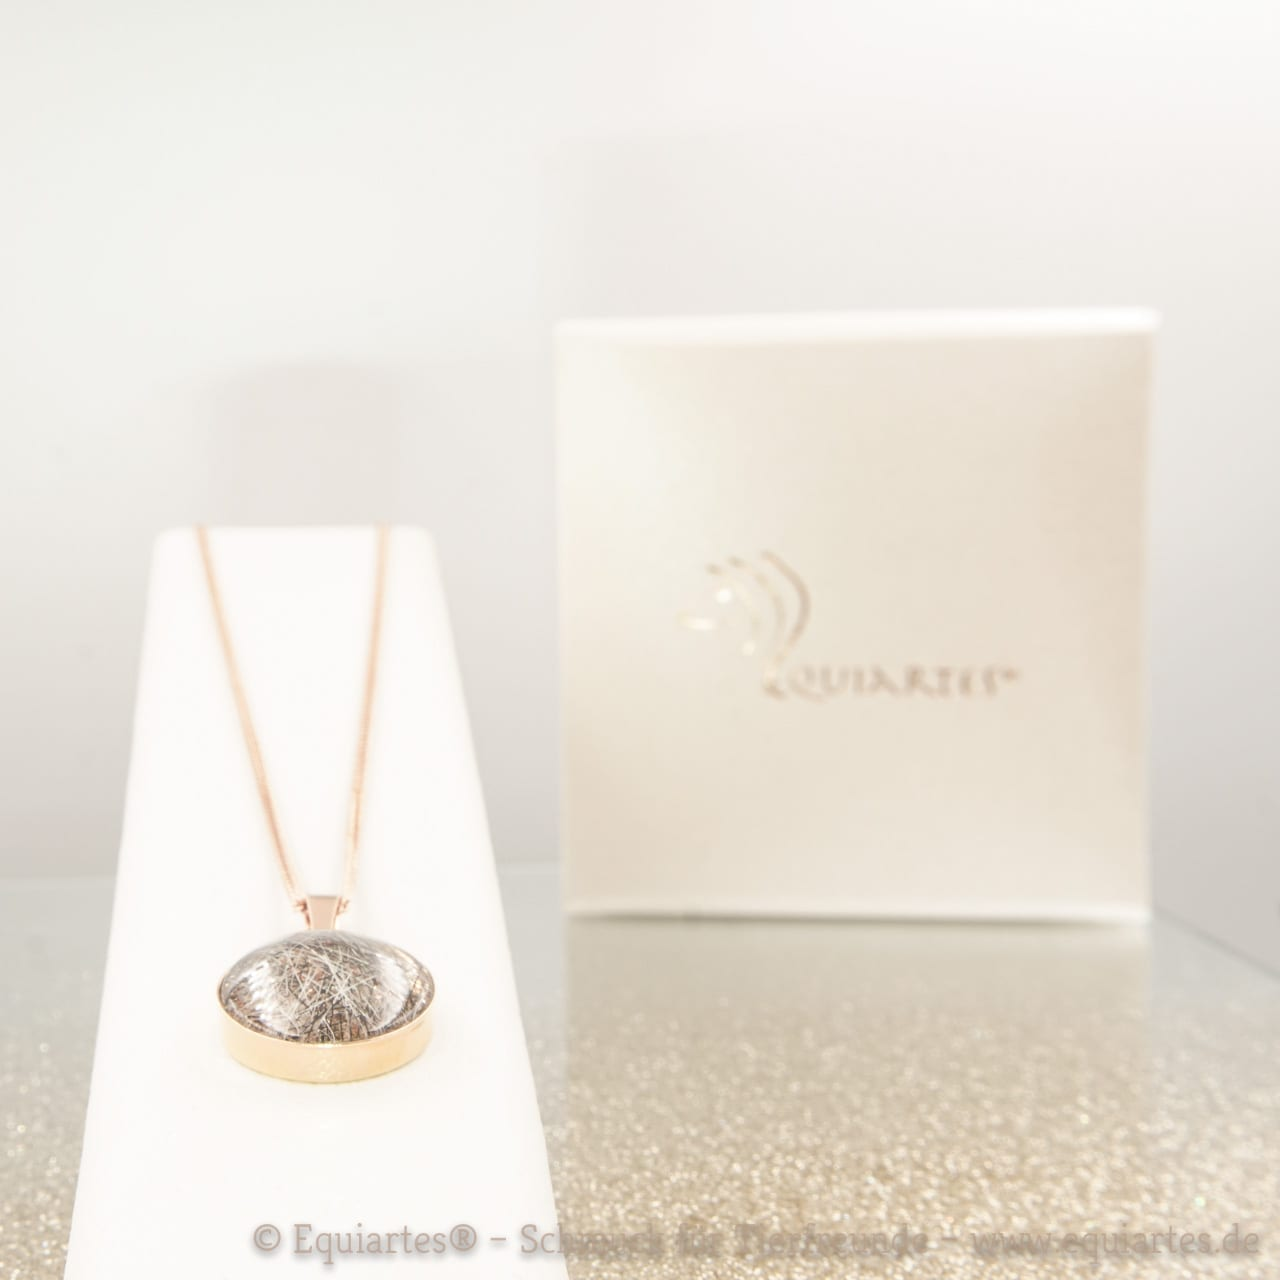 Persönlicher Memory-Schmuck: Medaillon mit Cabochon 925 Silber rosé